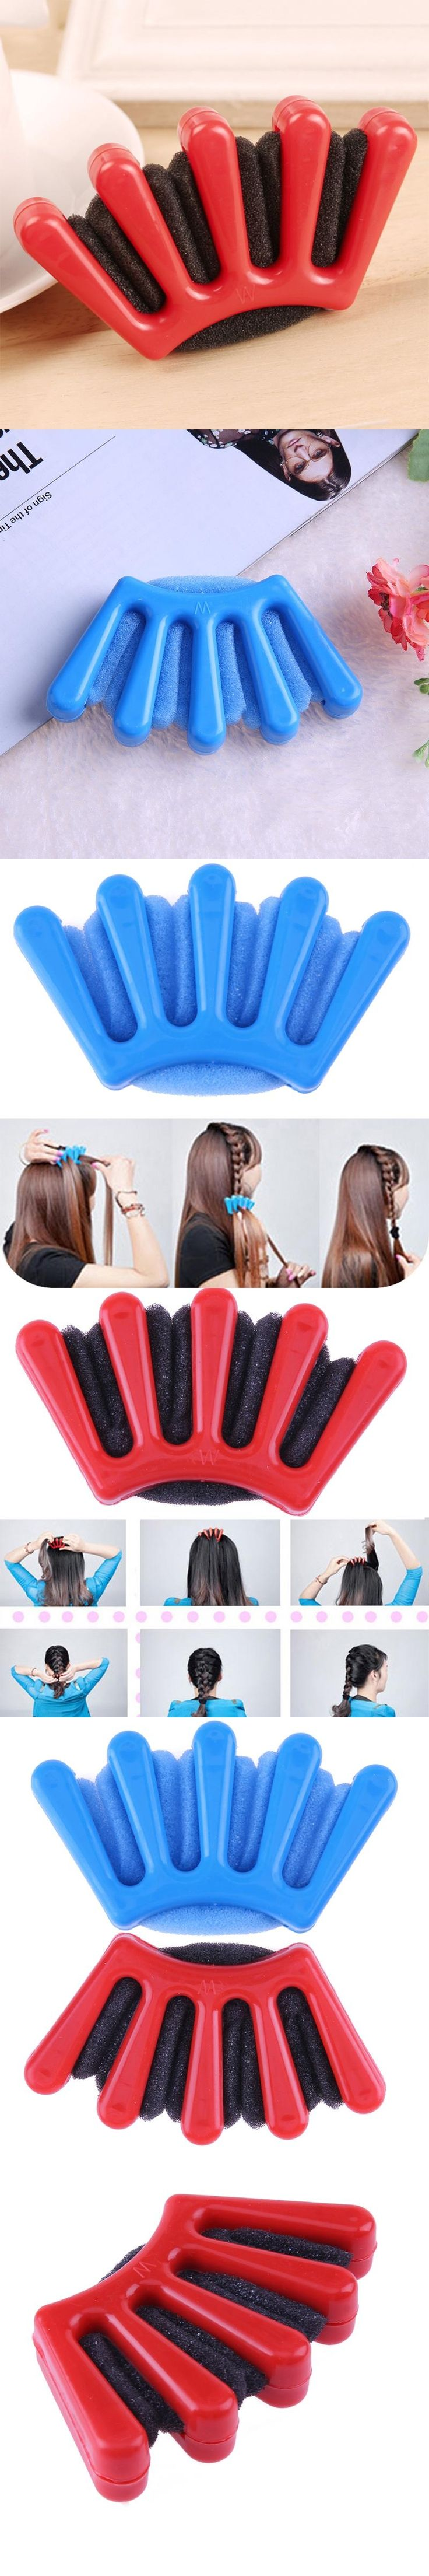 Portable Plastic DIY Hair Braider Tools Home Use Creative Hair Styling Twist Pigtail Hair Braiding Tool